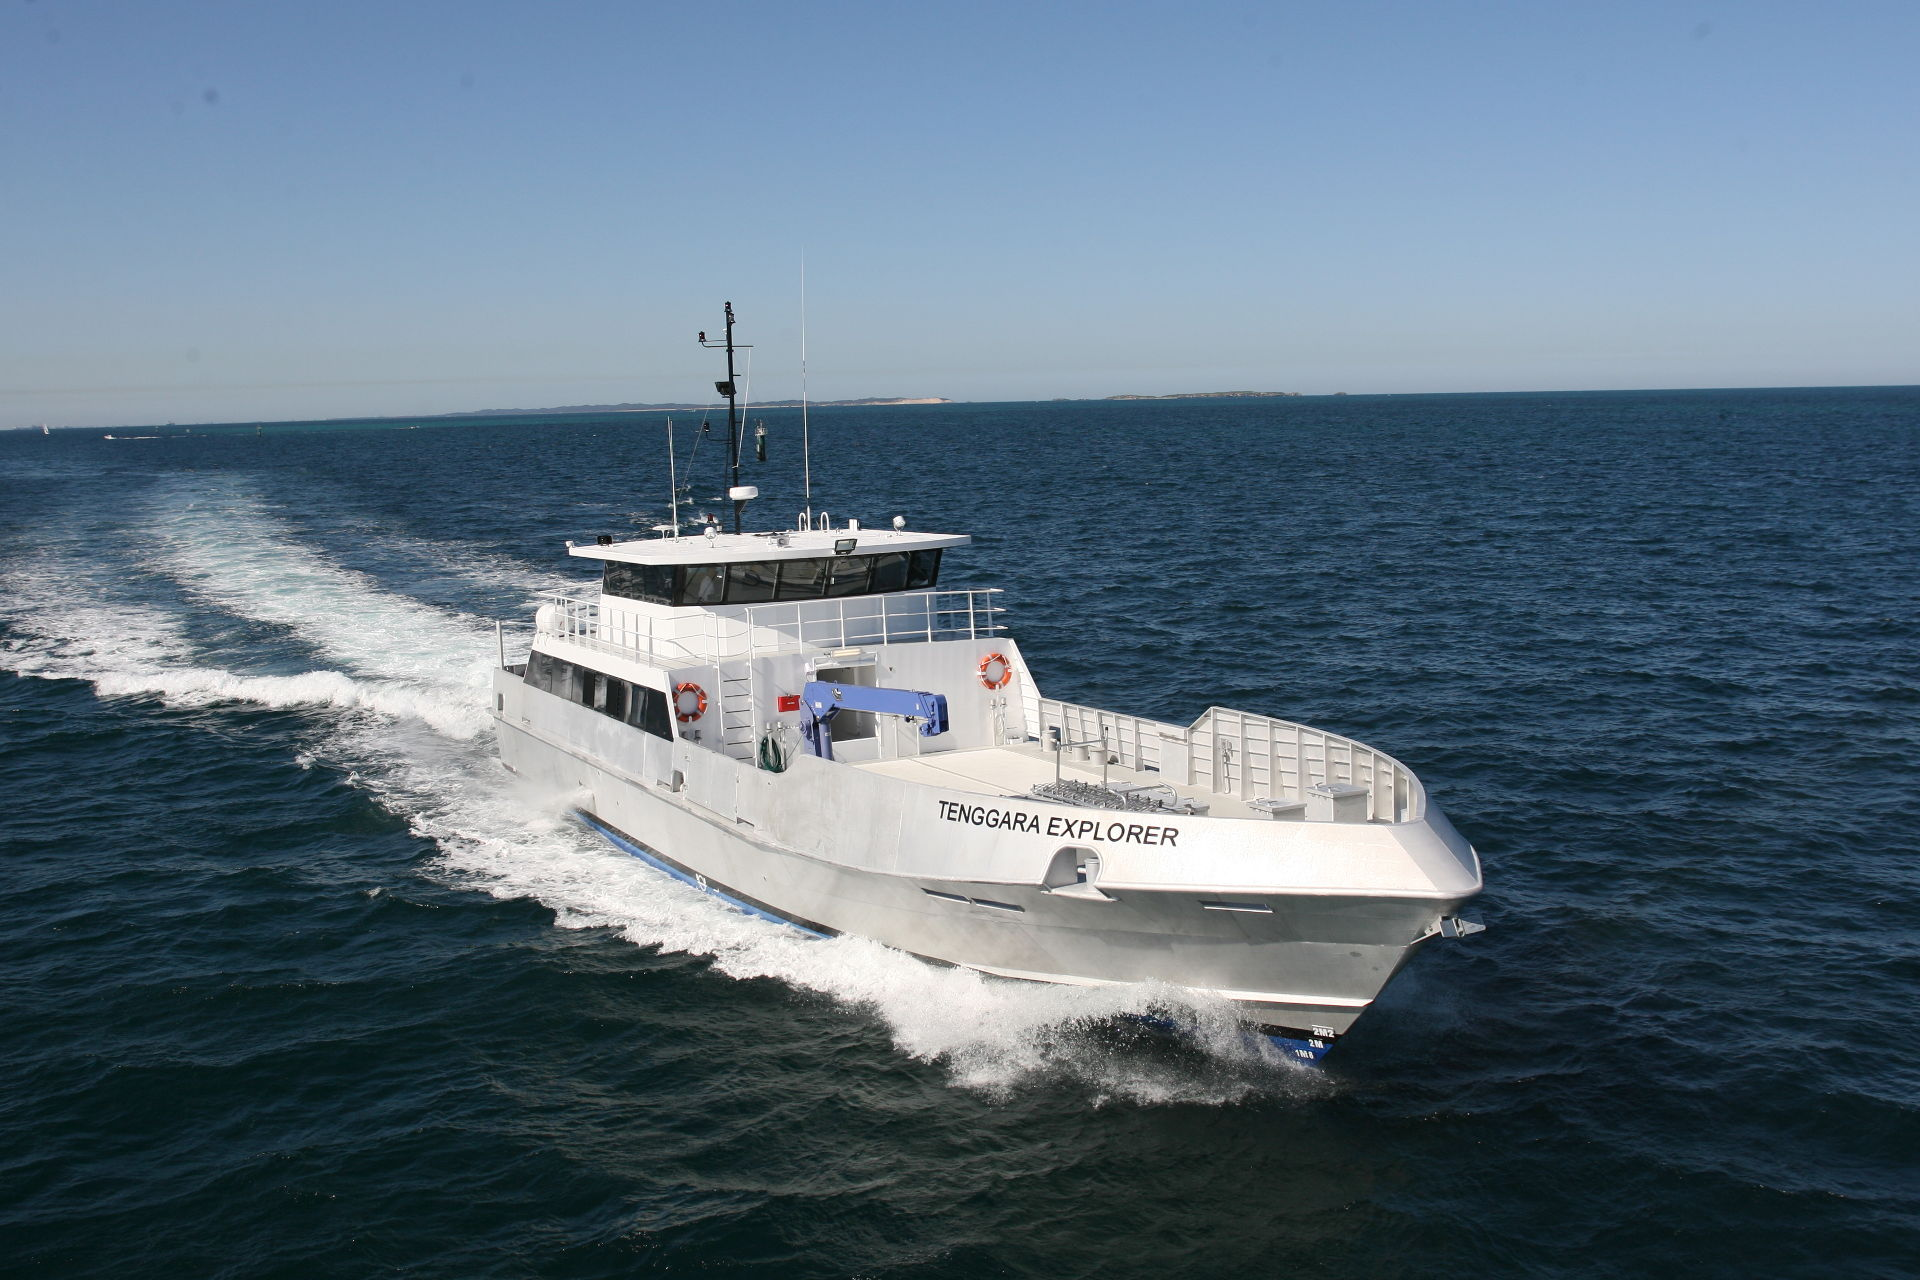 boat-teggaraexplorer-sailing